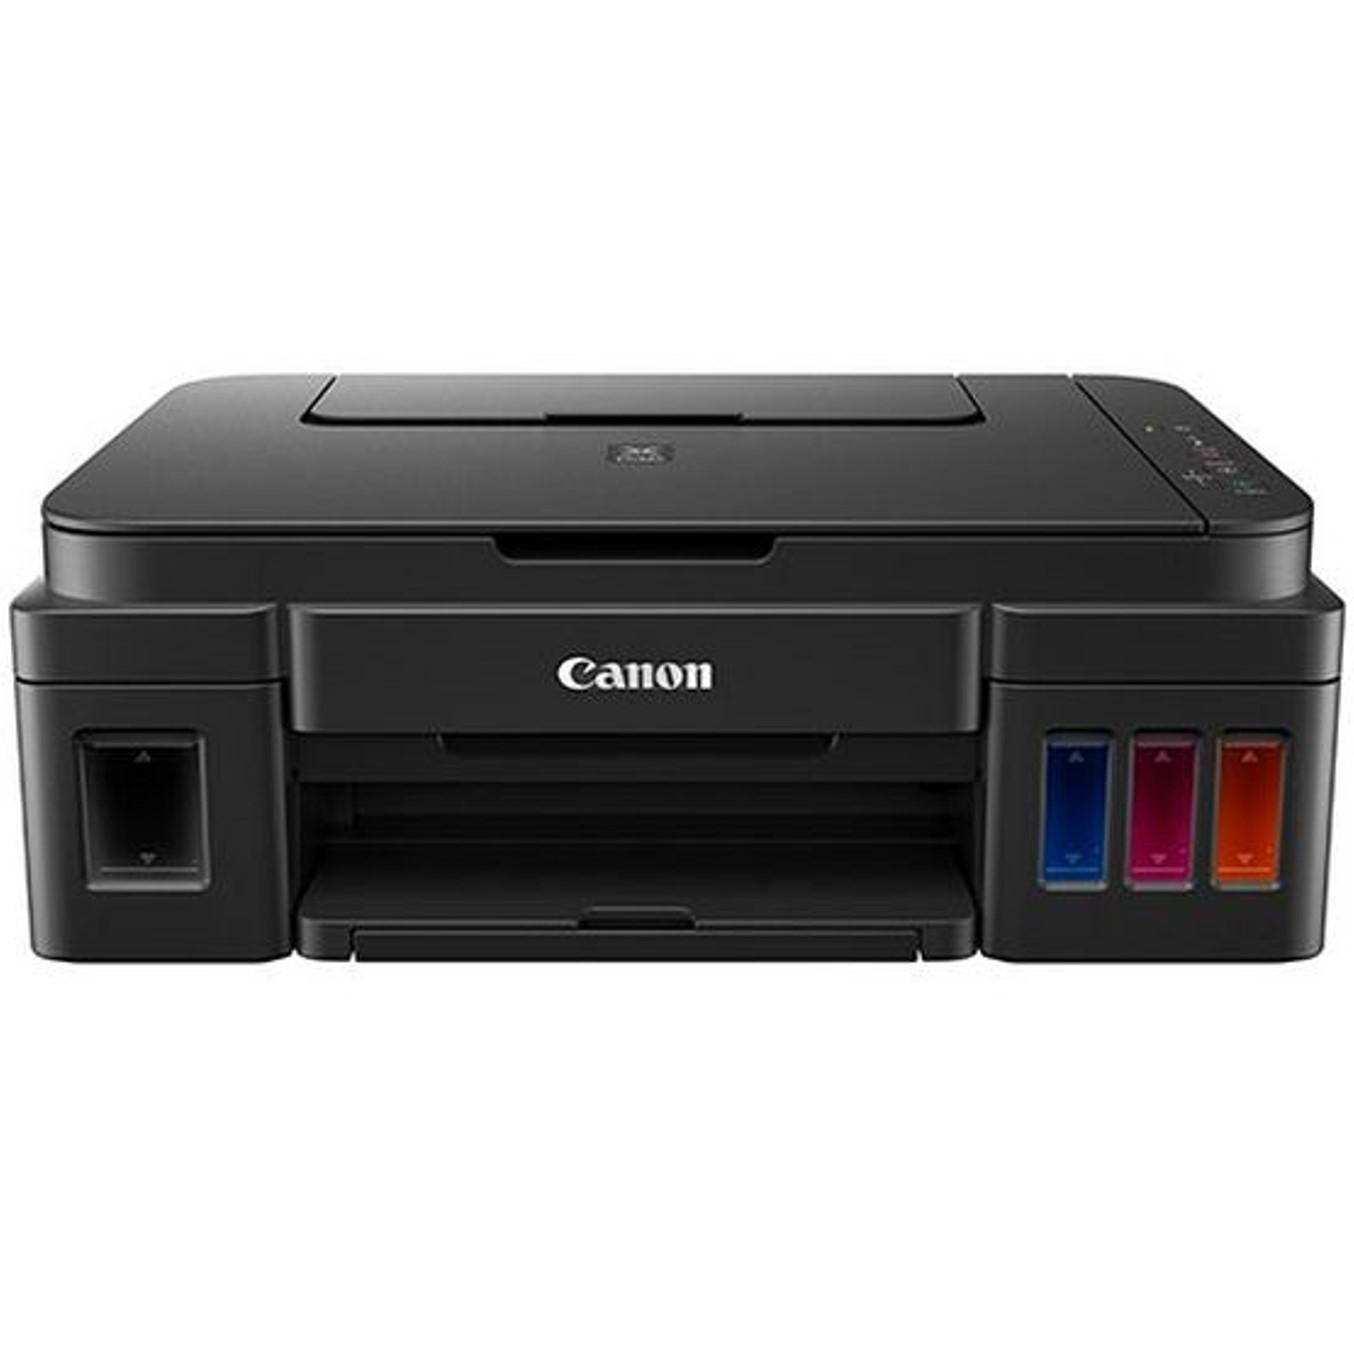 MULTIFUNCION CANON G2501 MEGATANK INYECCION COLOR PIXMA A4/ 8.8PPM/ 4800PPP/ USB/ 1 BOTELLA TINTA